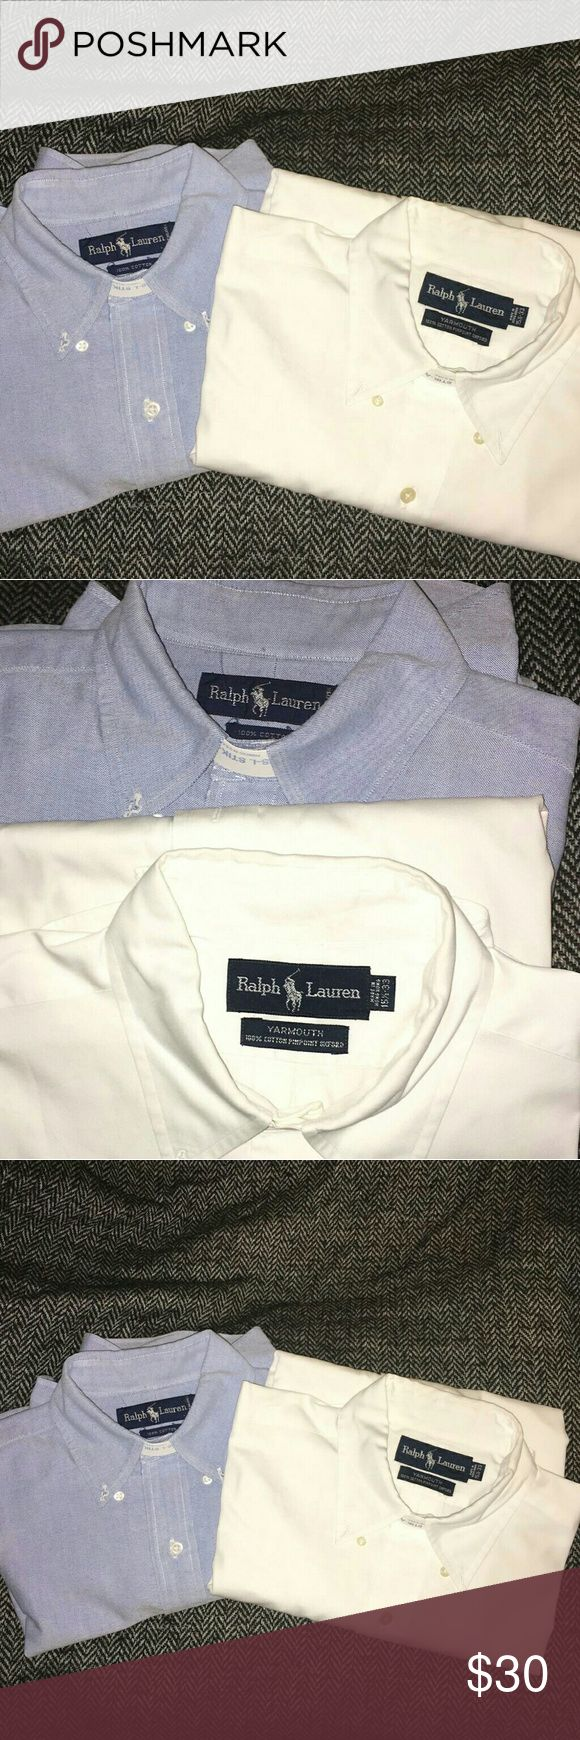 RALPH LAUREN MENS LONG SLEEVE BUTTON UP Two nice Ralph Lauren Mens Shirts - BOGO! Back from the Dry Cleaner: White & Light Blue Ralph Lauren Black Label Shirts Dress Shirts